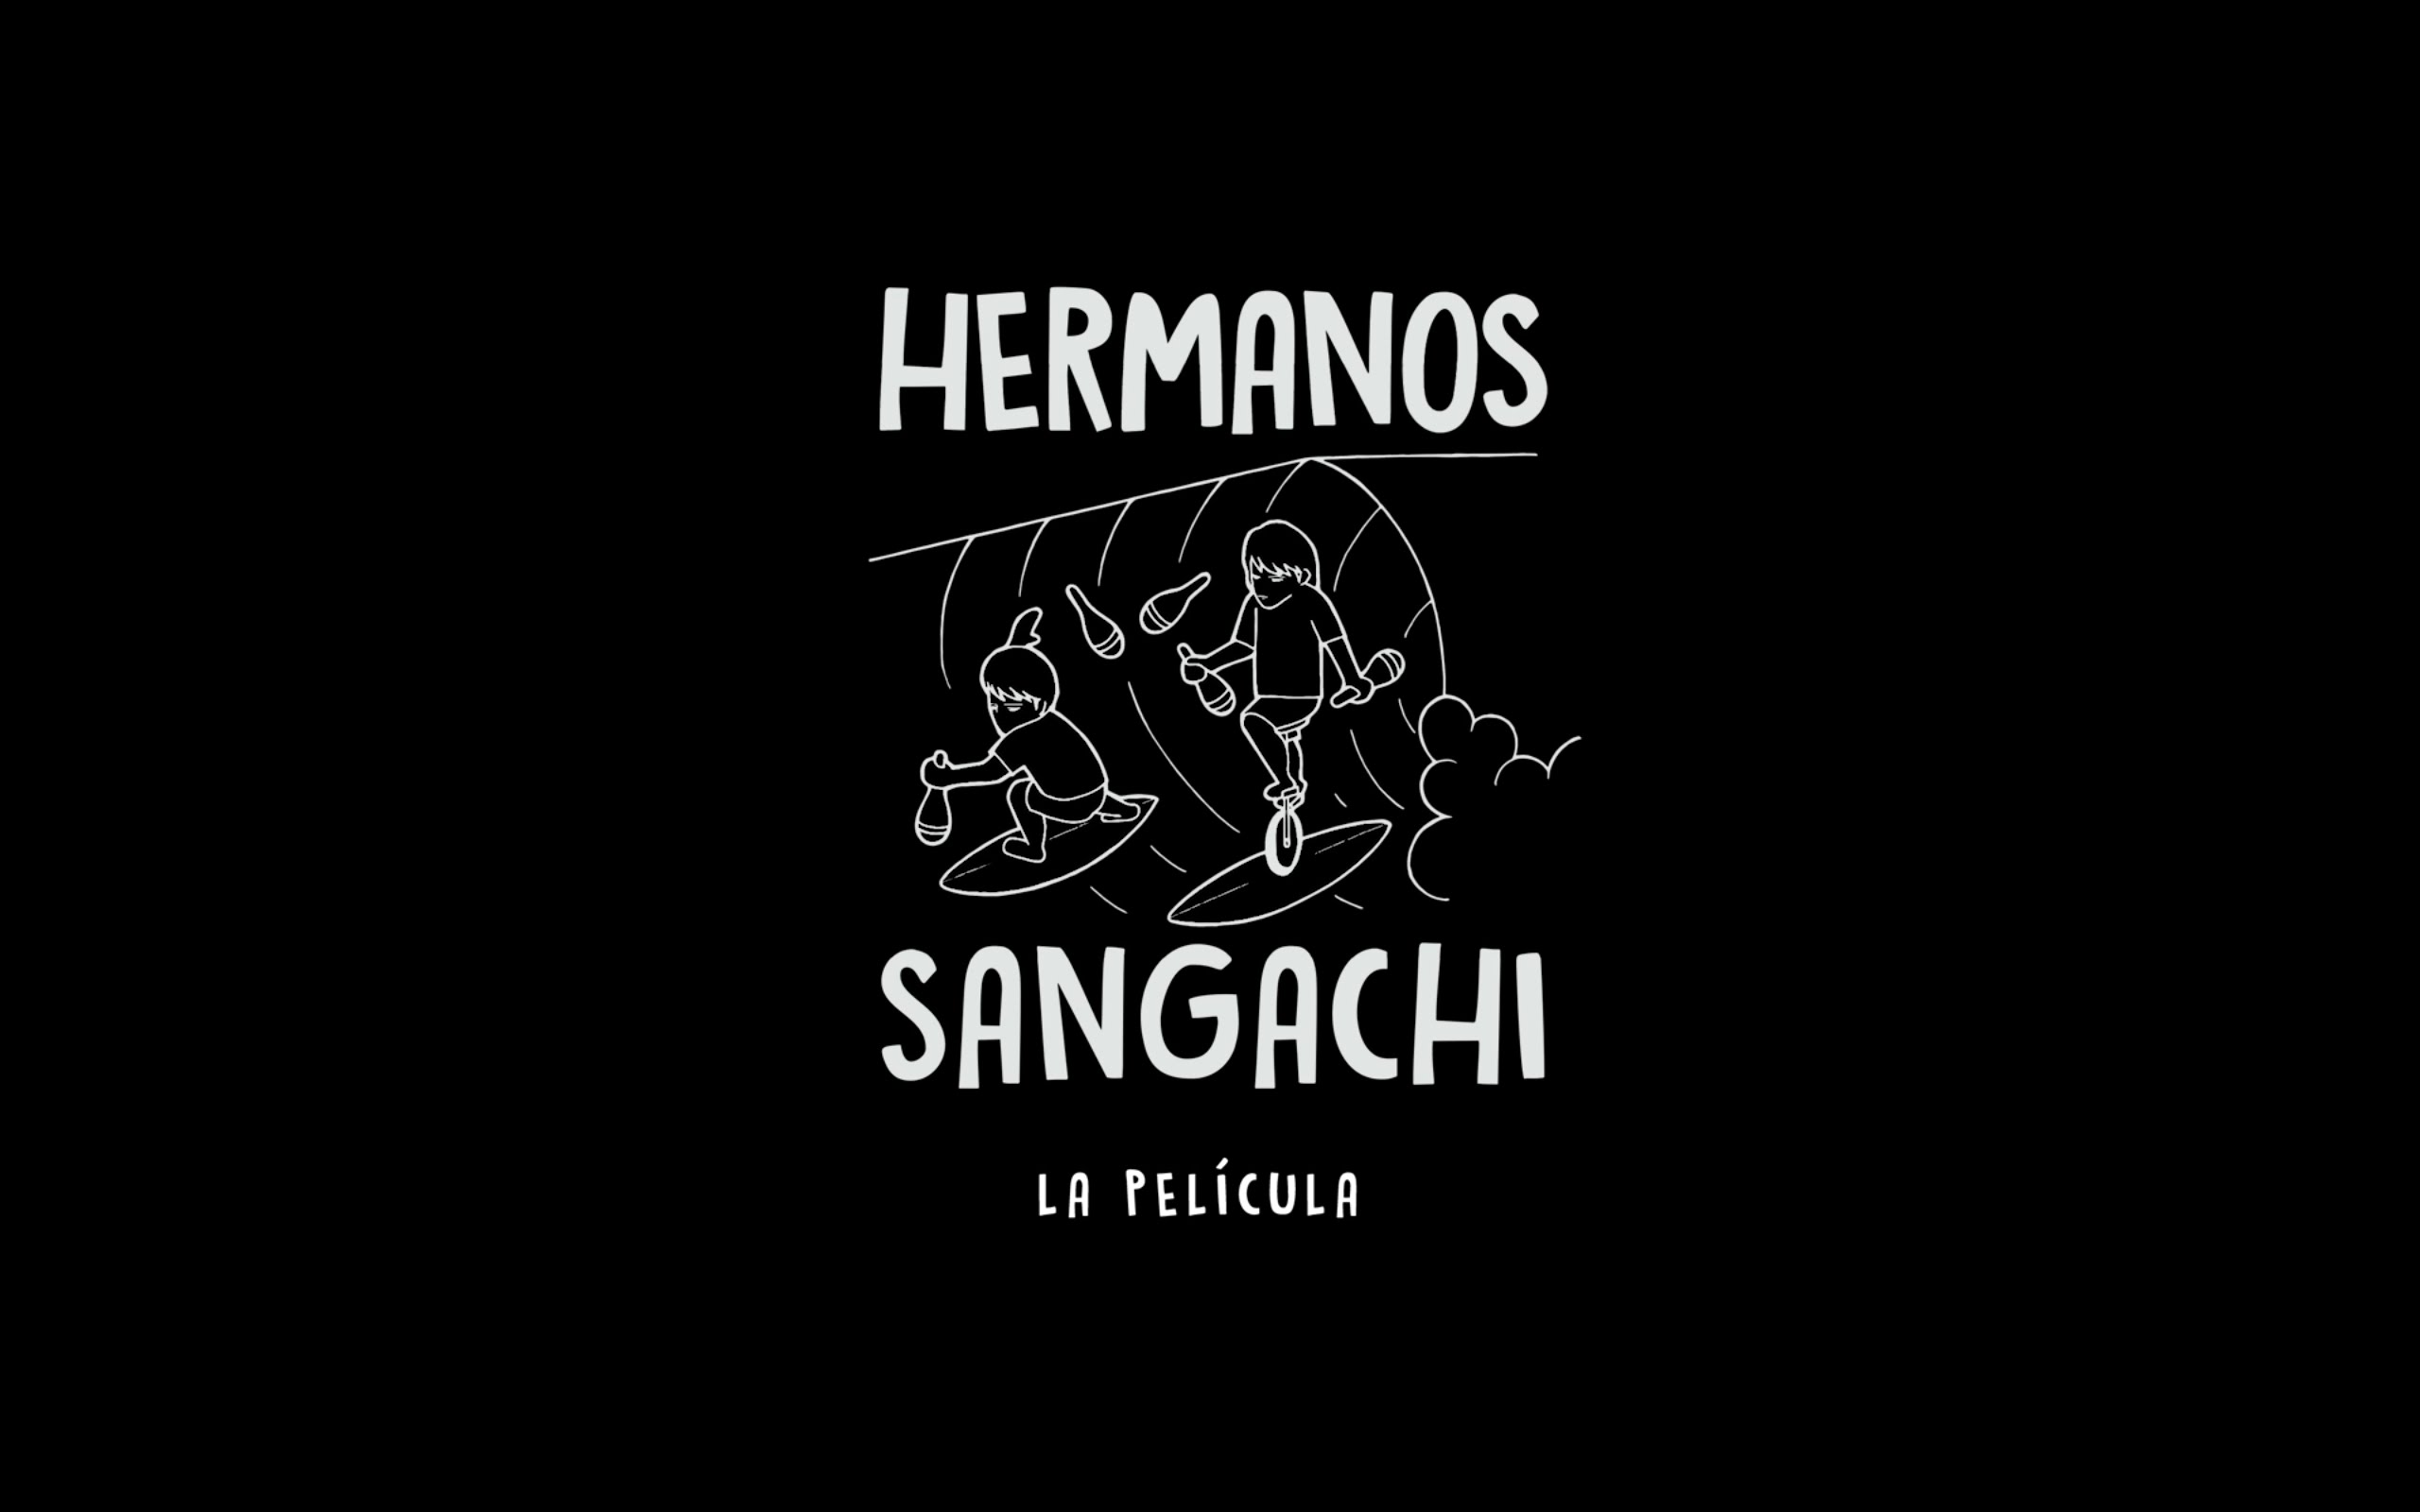 Los Hermanos Sangachi